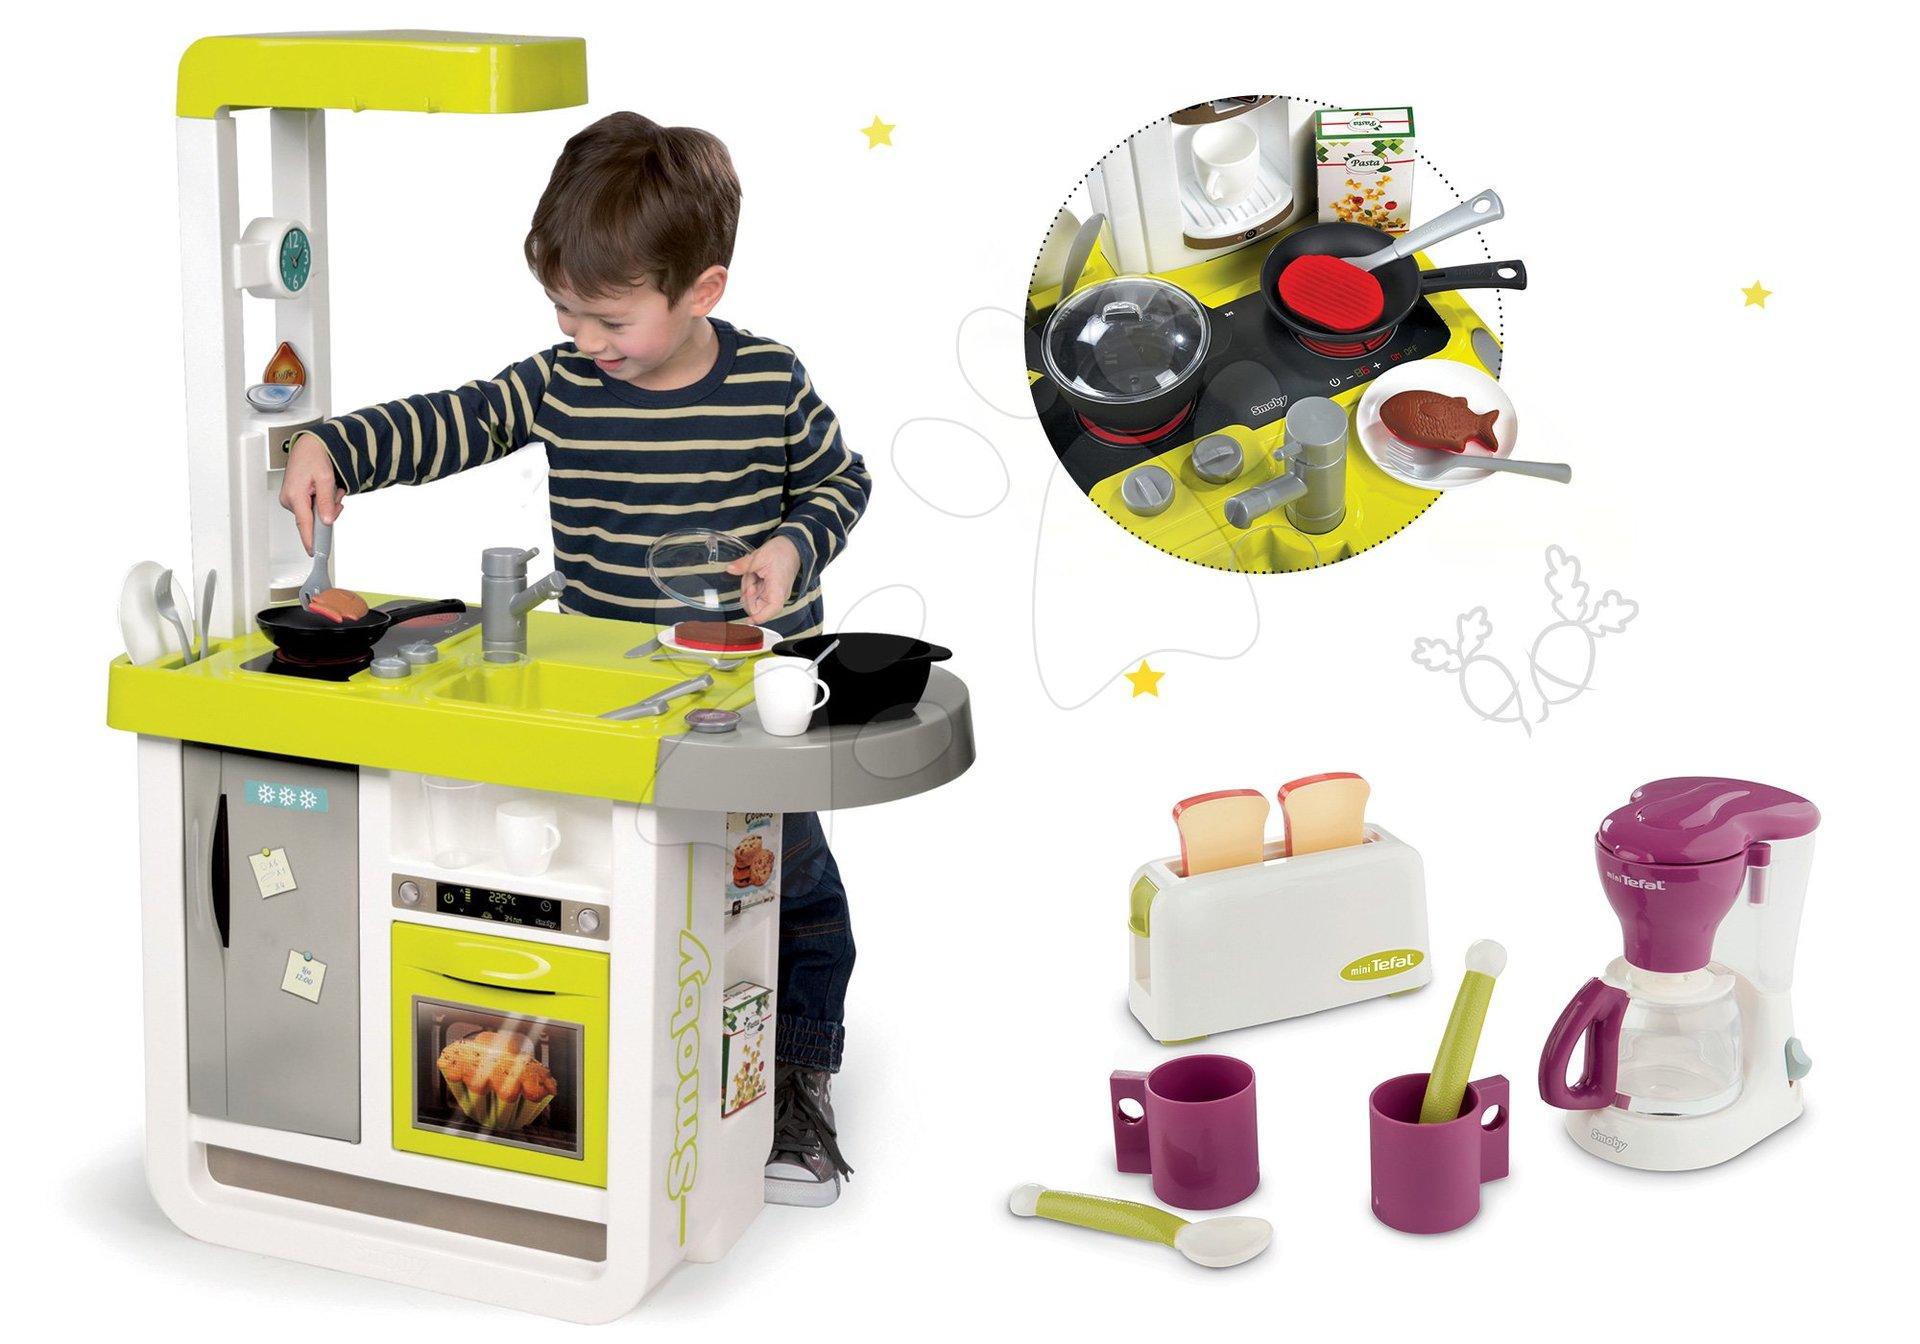 Smoby set detská kuchynka elektronická Cherry a raňajkový set s kávovarom a toasterom Tefal 310908-8